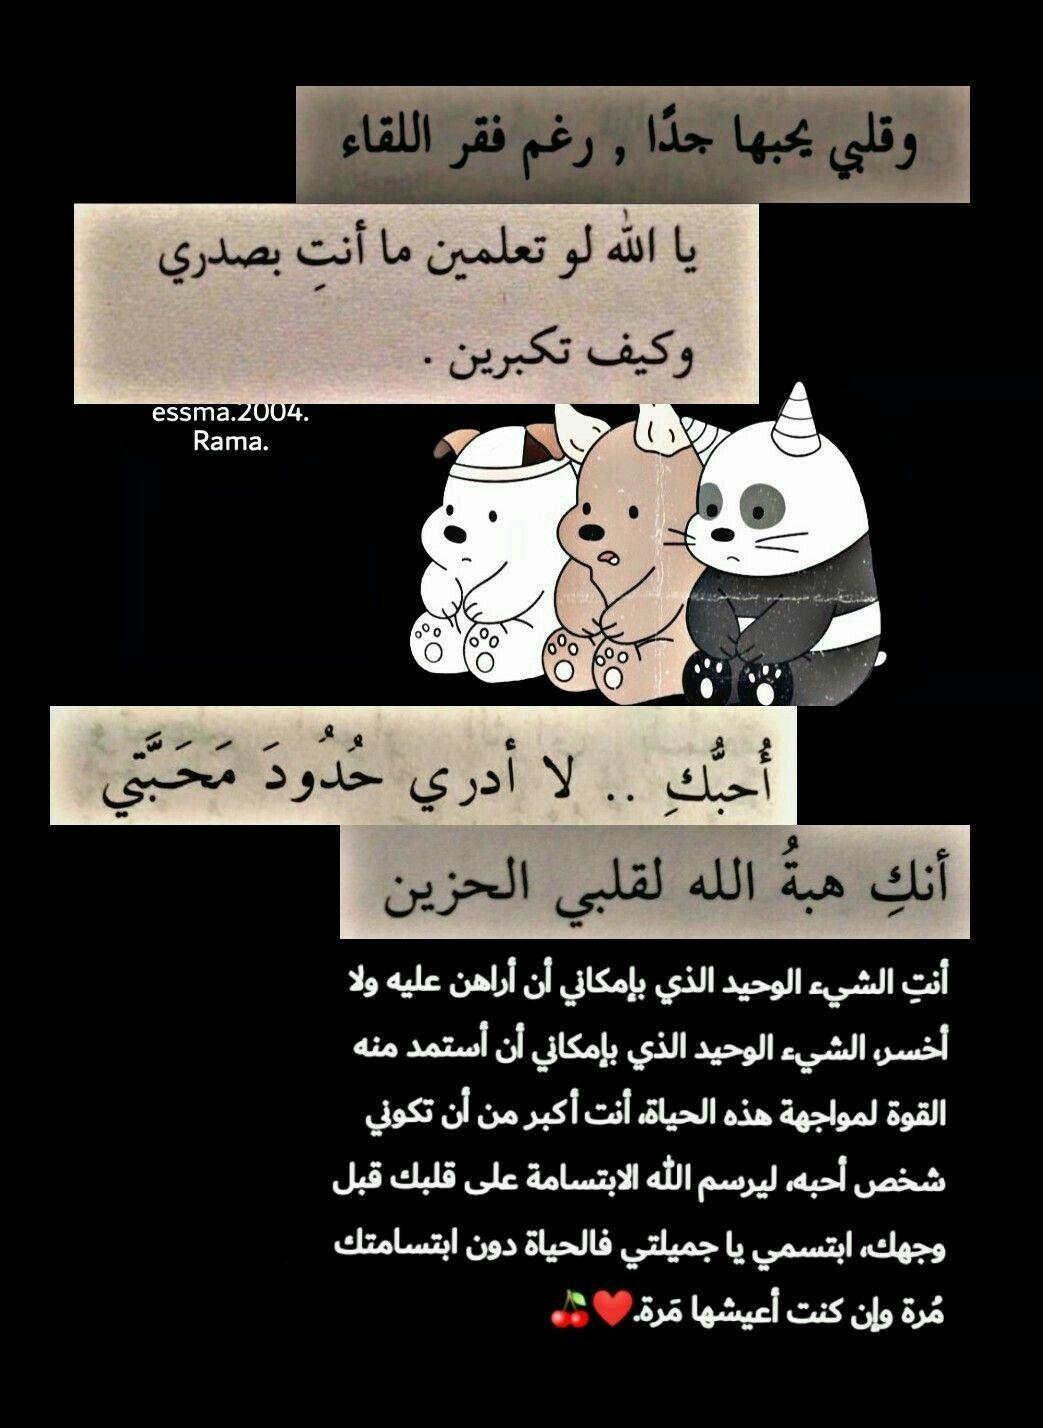 بحبك يا راما Bollywood Love Quotes Funny Arabic Quotes Birthday Quotes For Best Friend